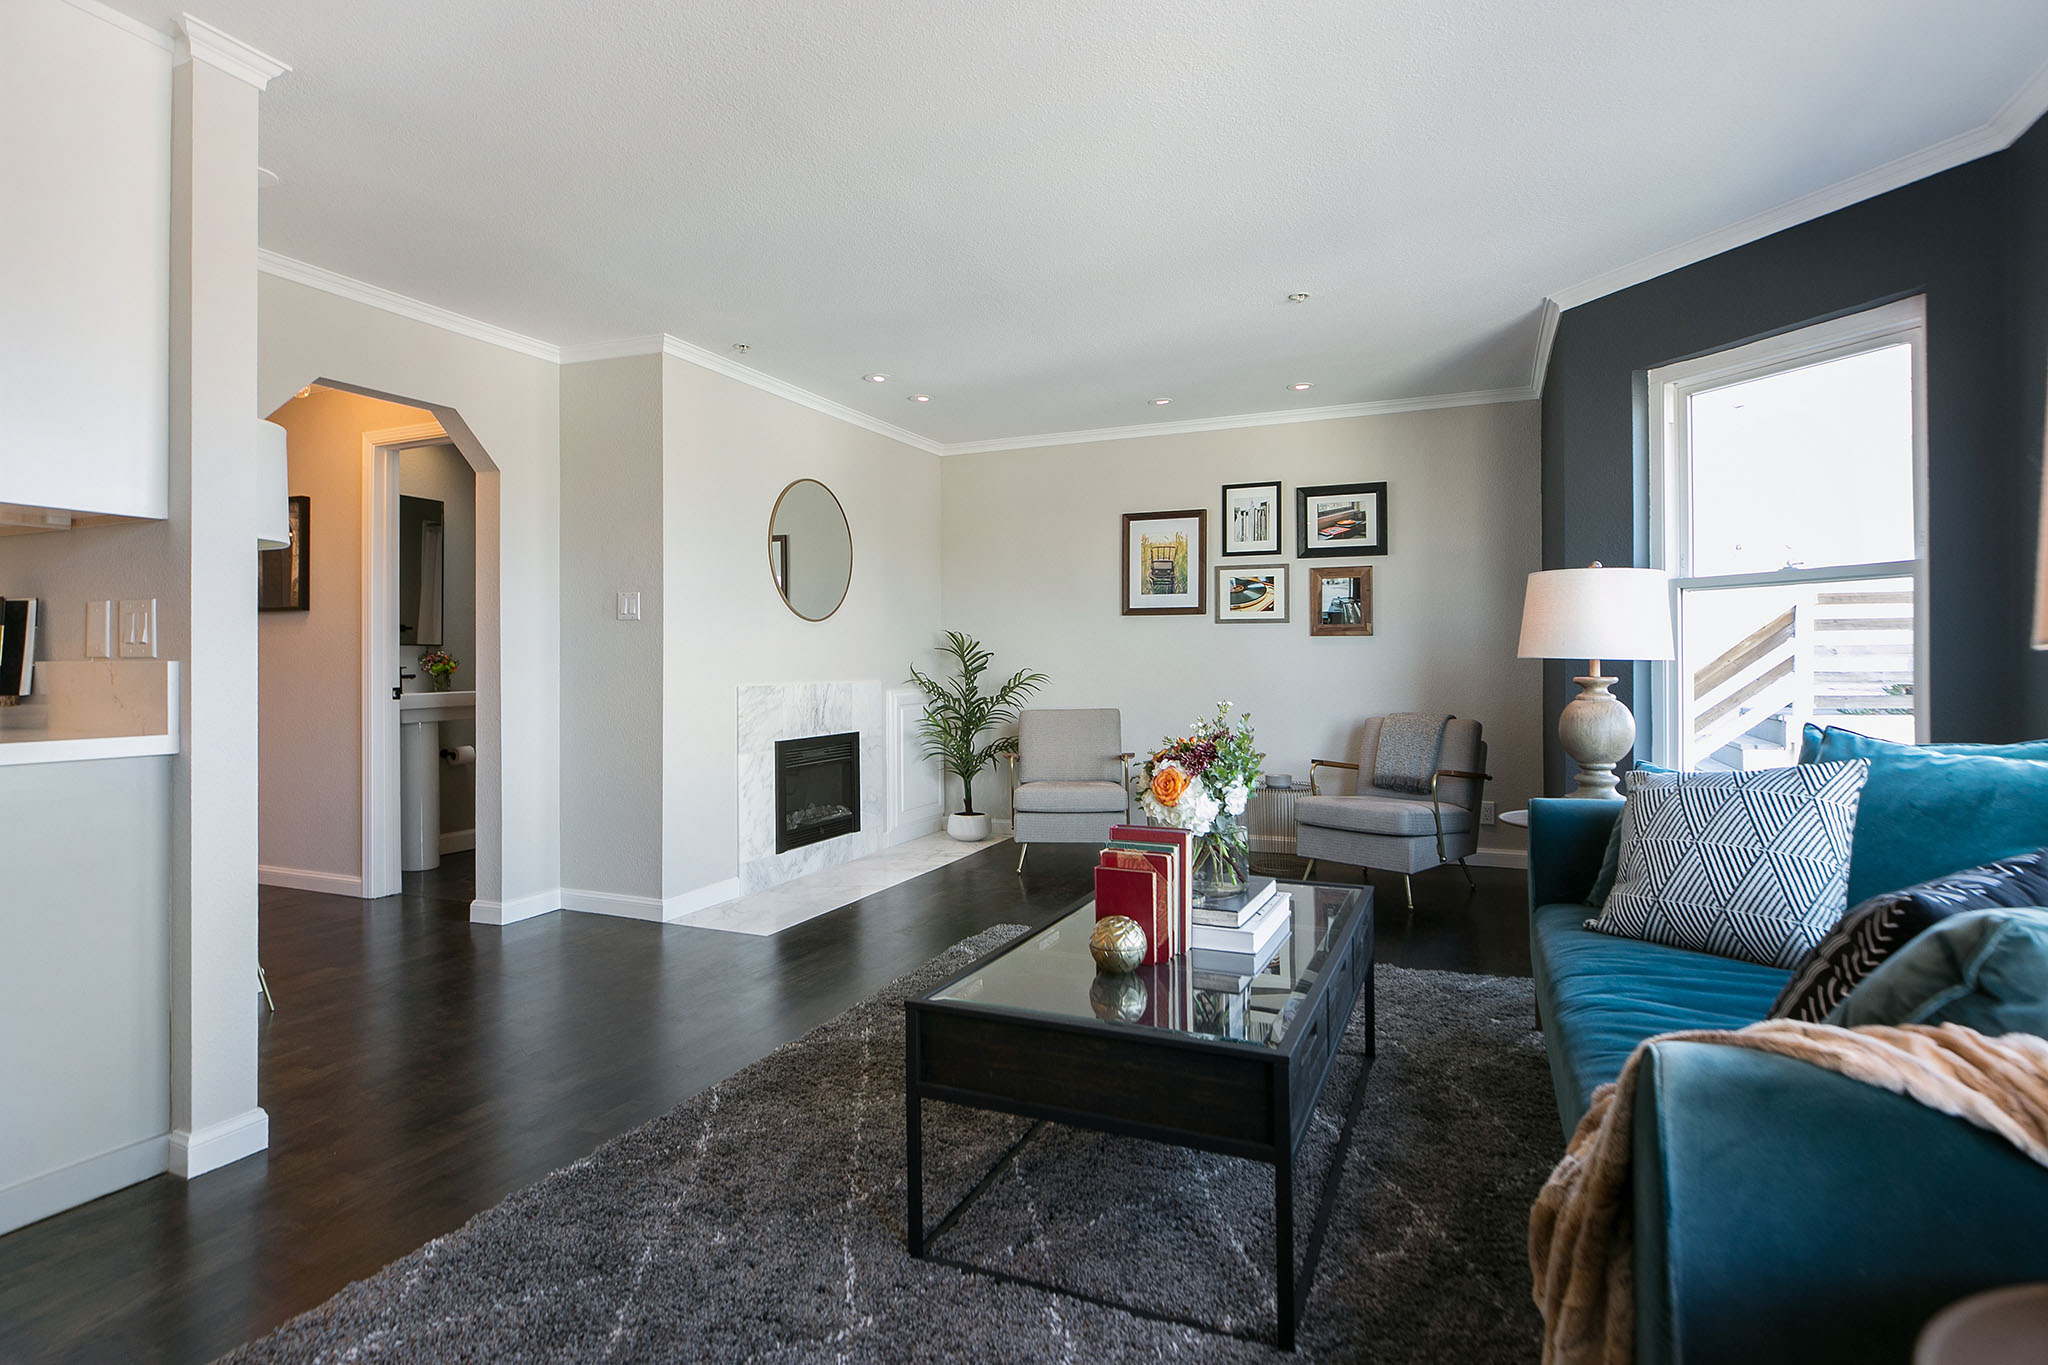 San Francisco Home - Living Room